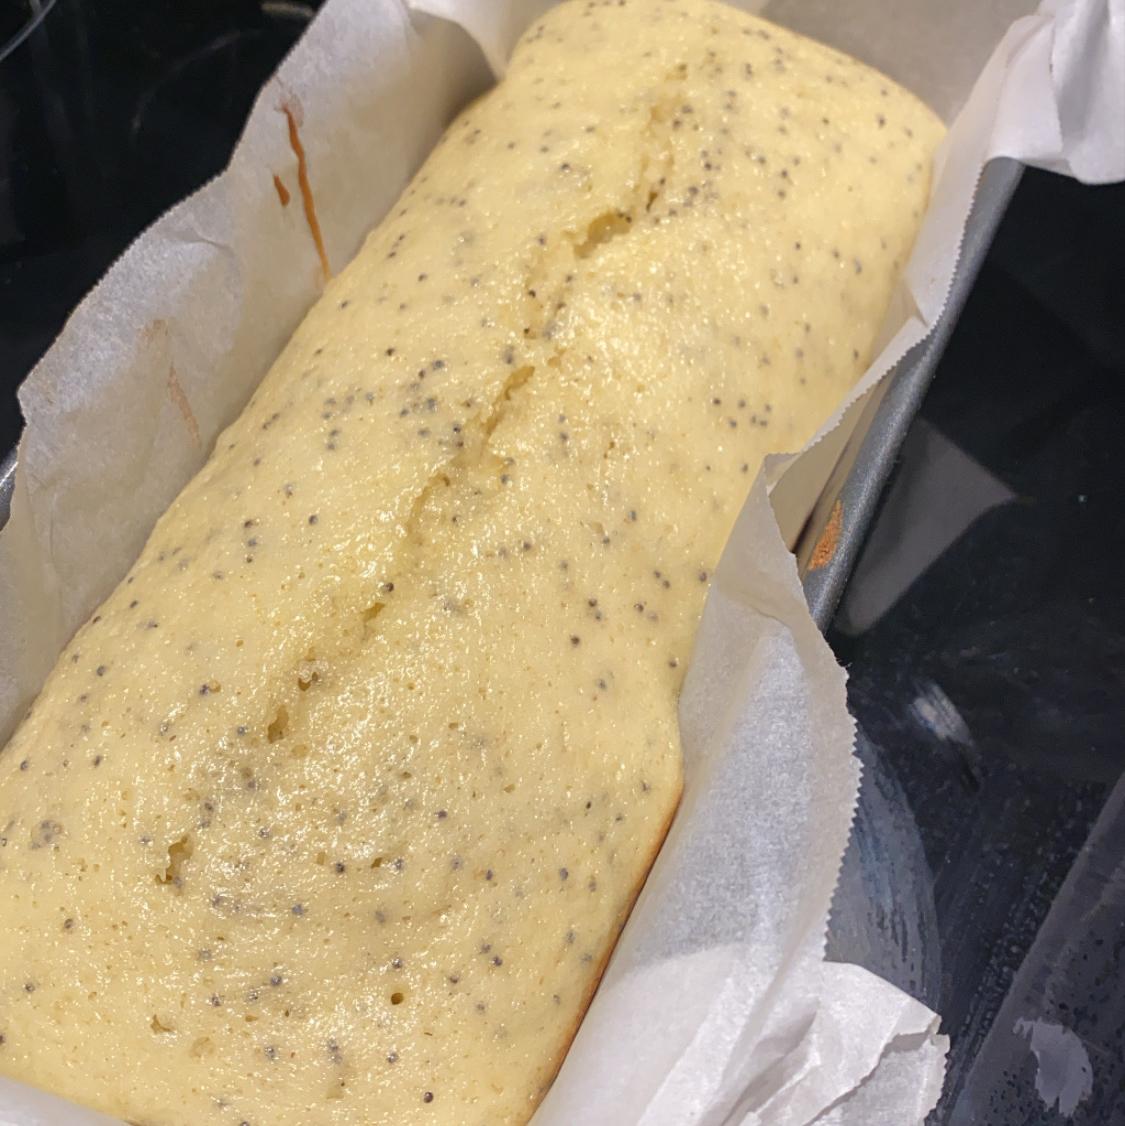 Lemon Poppy Seed Bread icfarukh